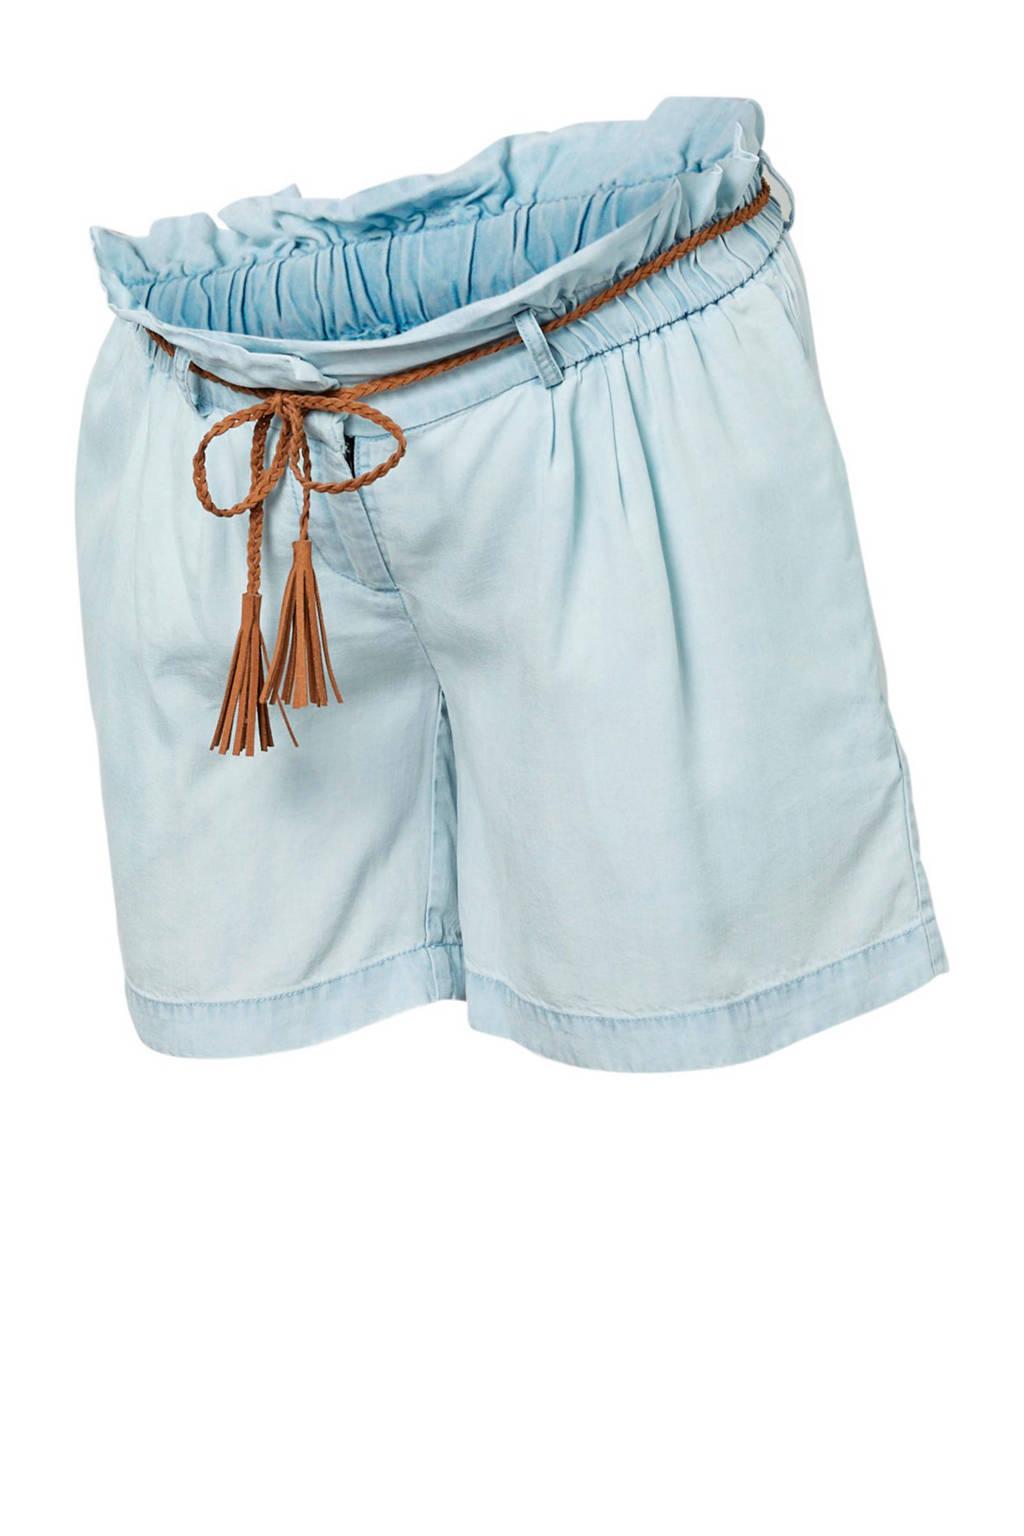 MAMA-LICIOUS zwangerschaps jeans short blauw, Blauw